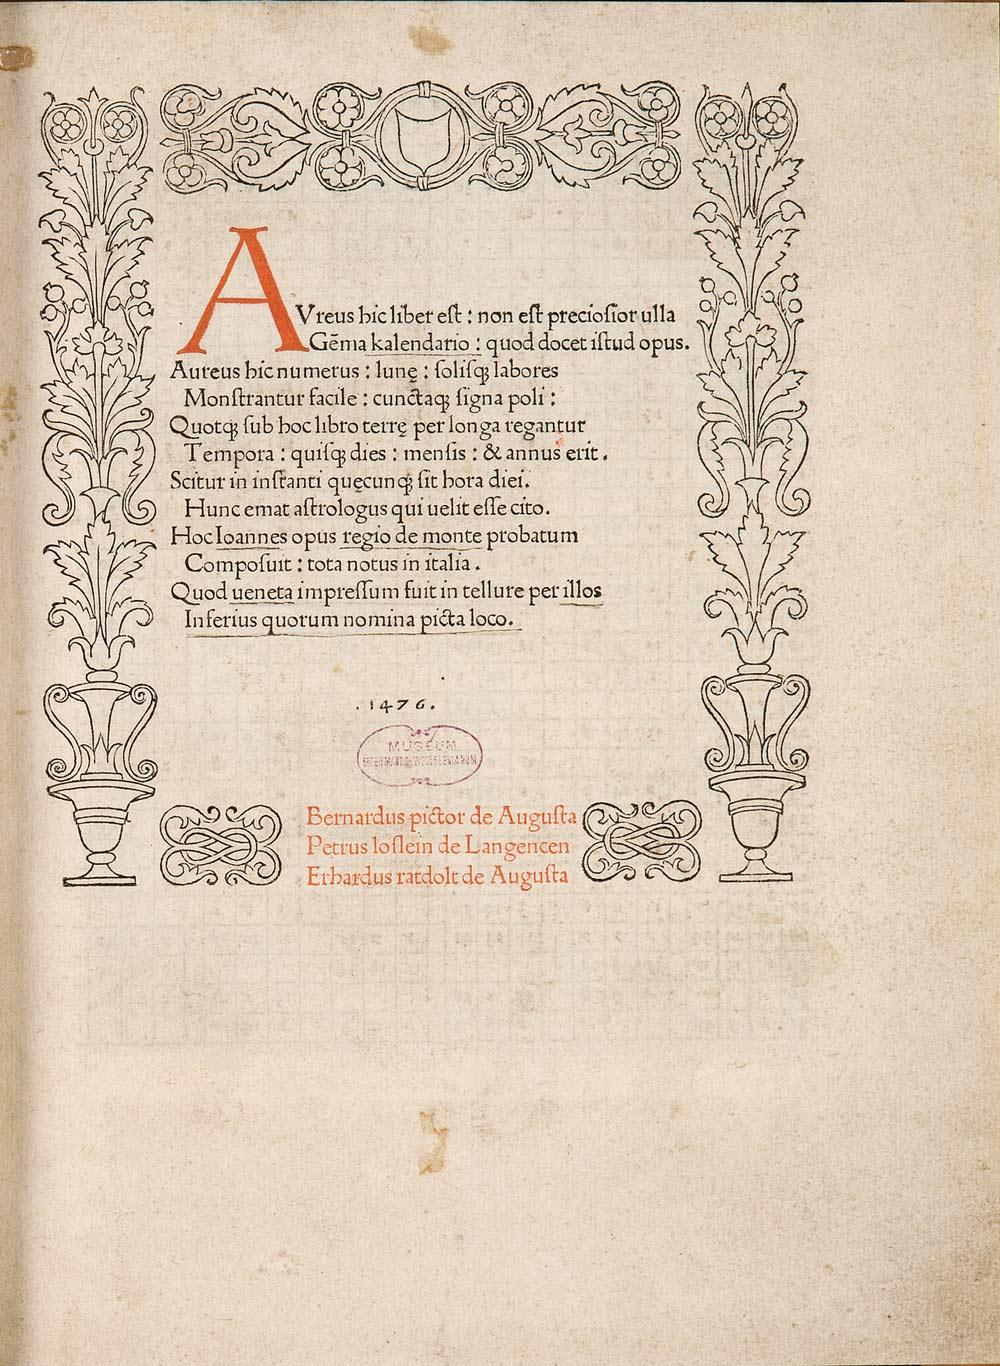 first-title-page-ratdolt-1476